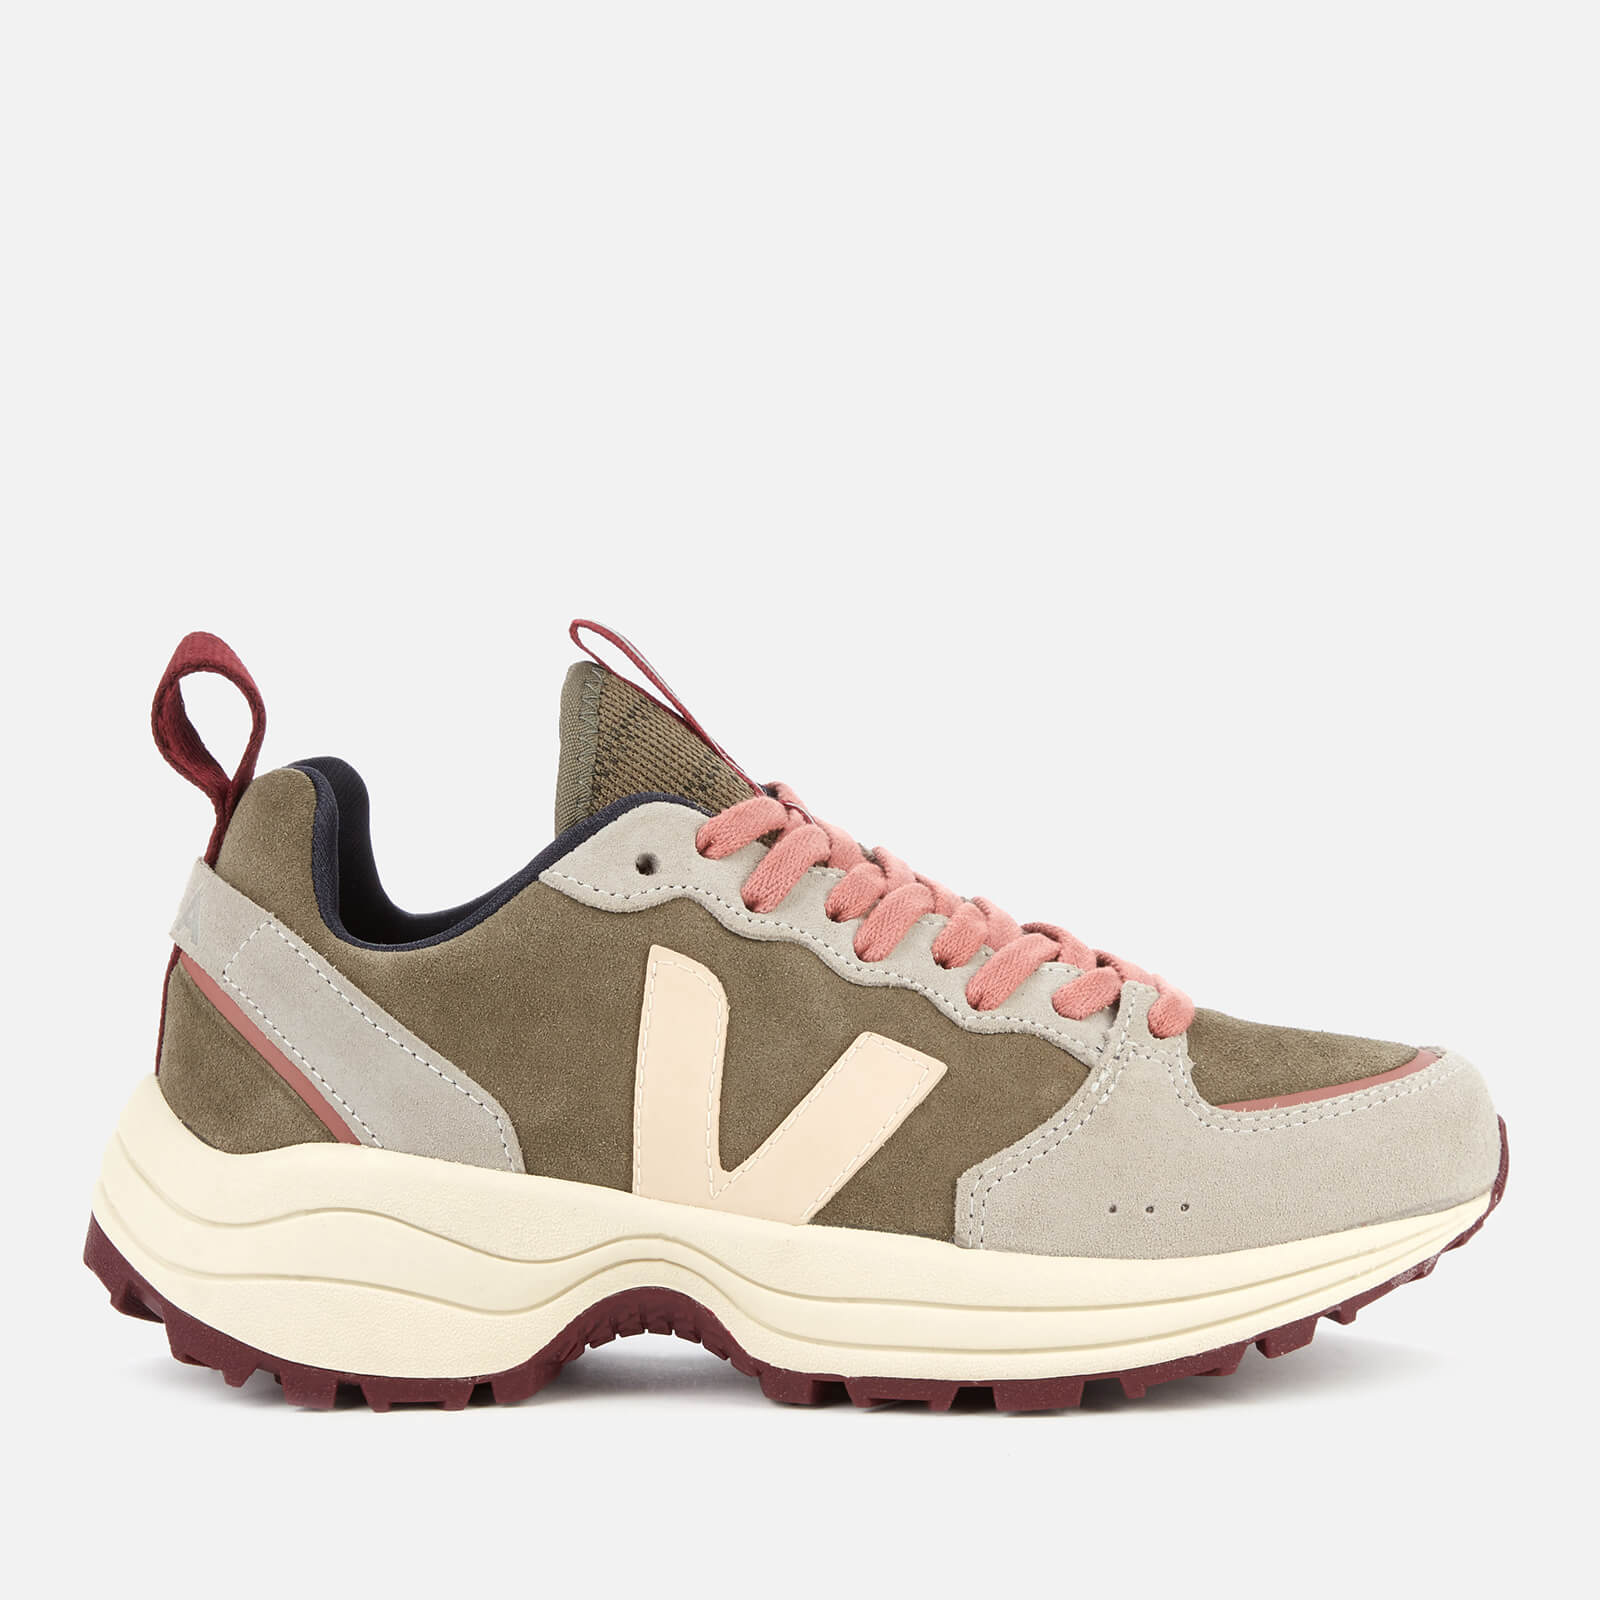 Veja Women's Venturi Suede Running Style Trainers - Khaki/Sable/Oxford Grey - UK 2